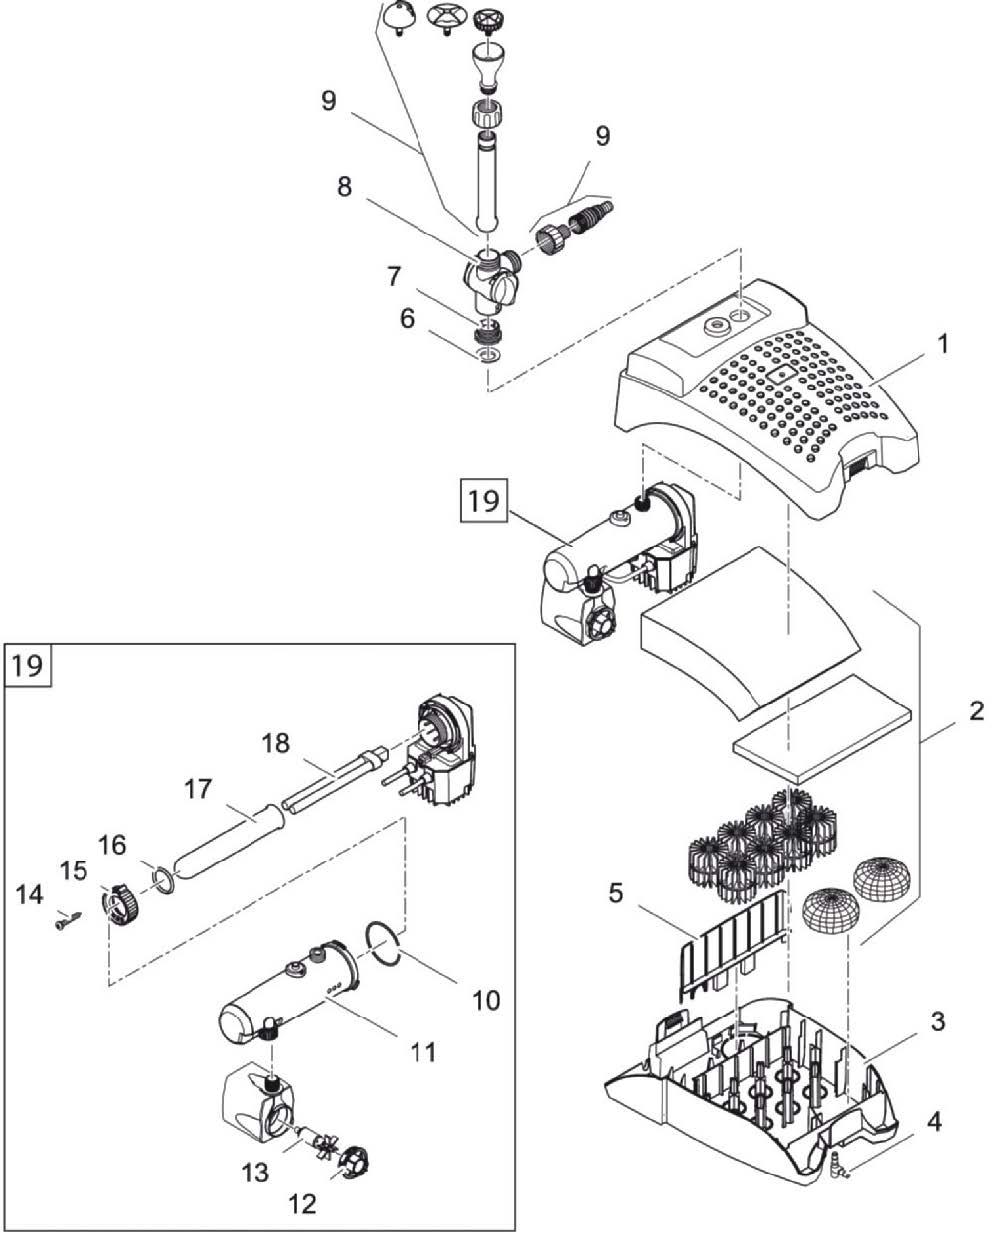 filtral-uvc-5000-spares